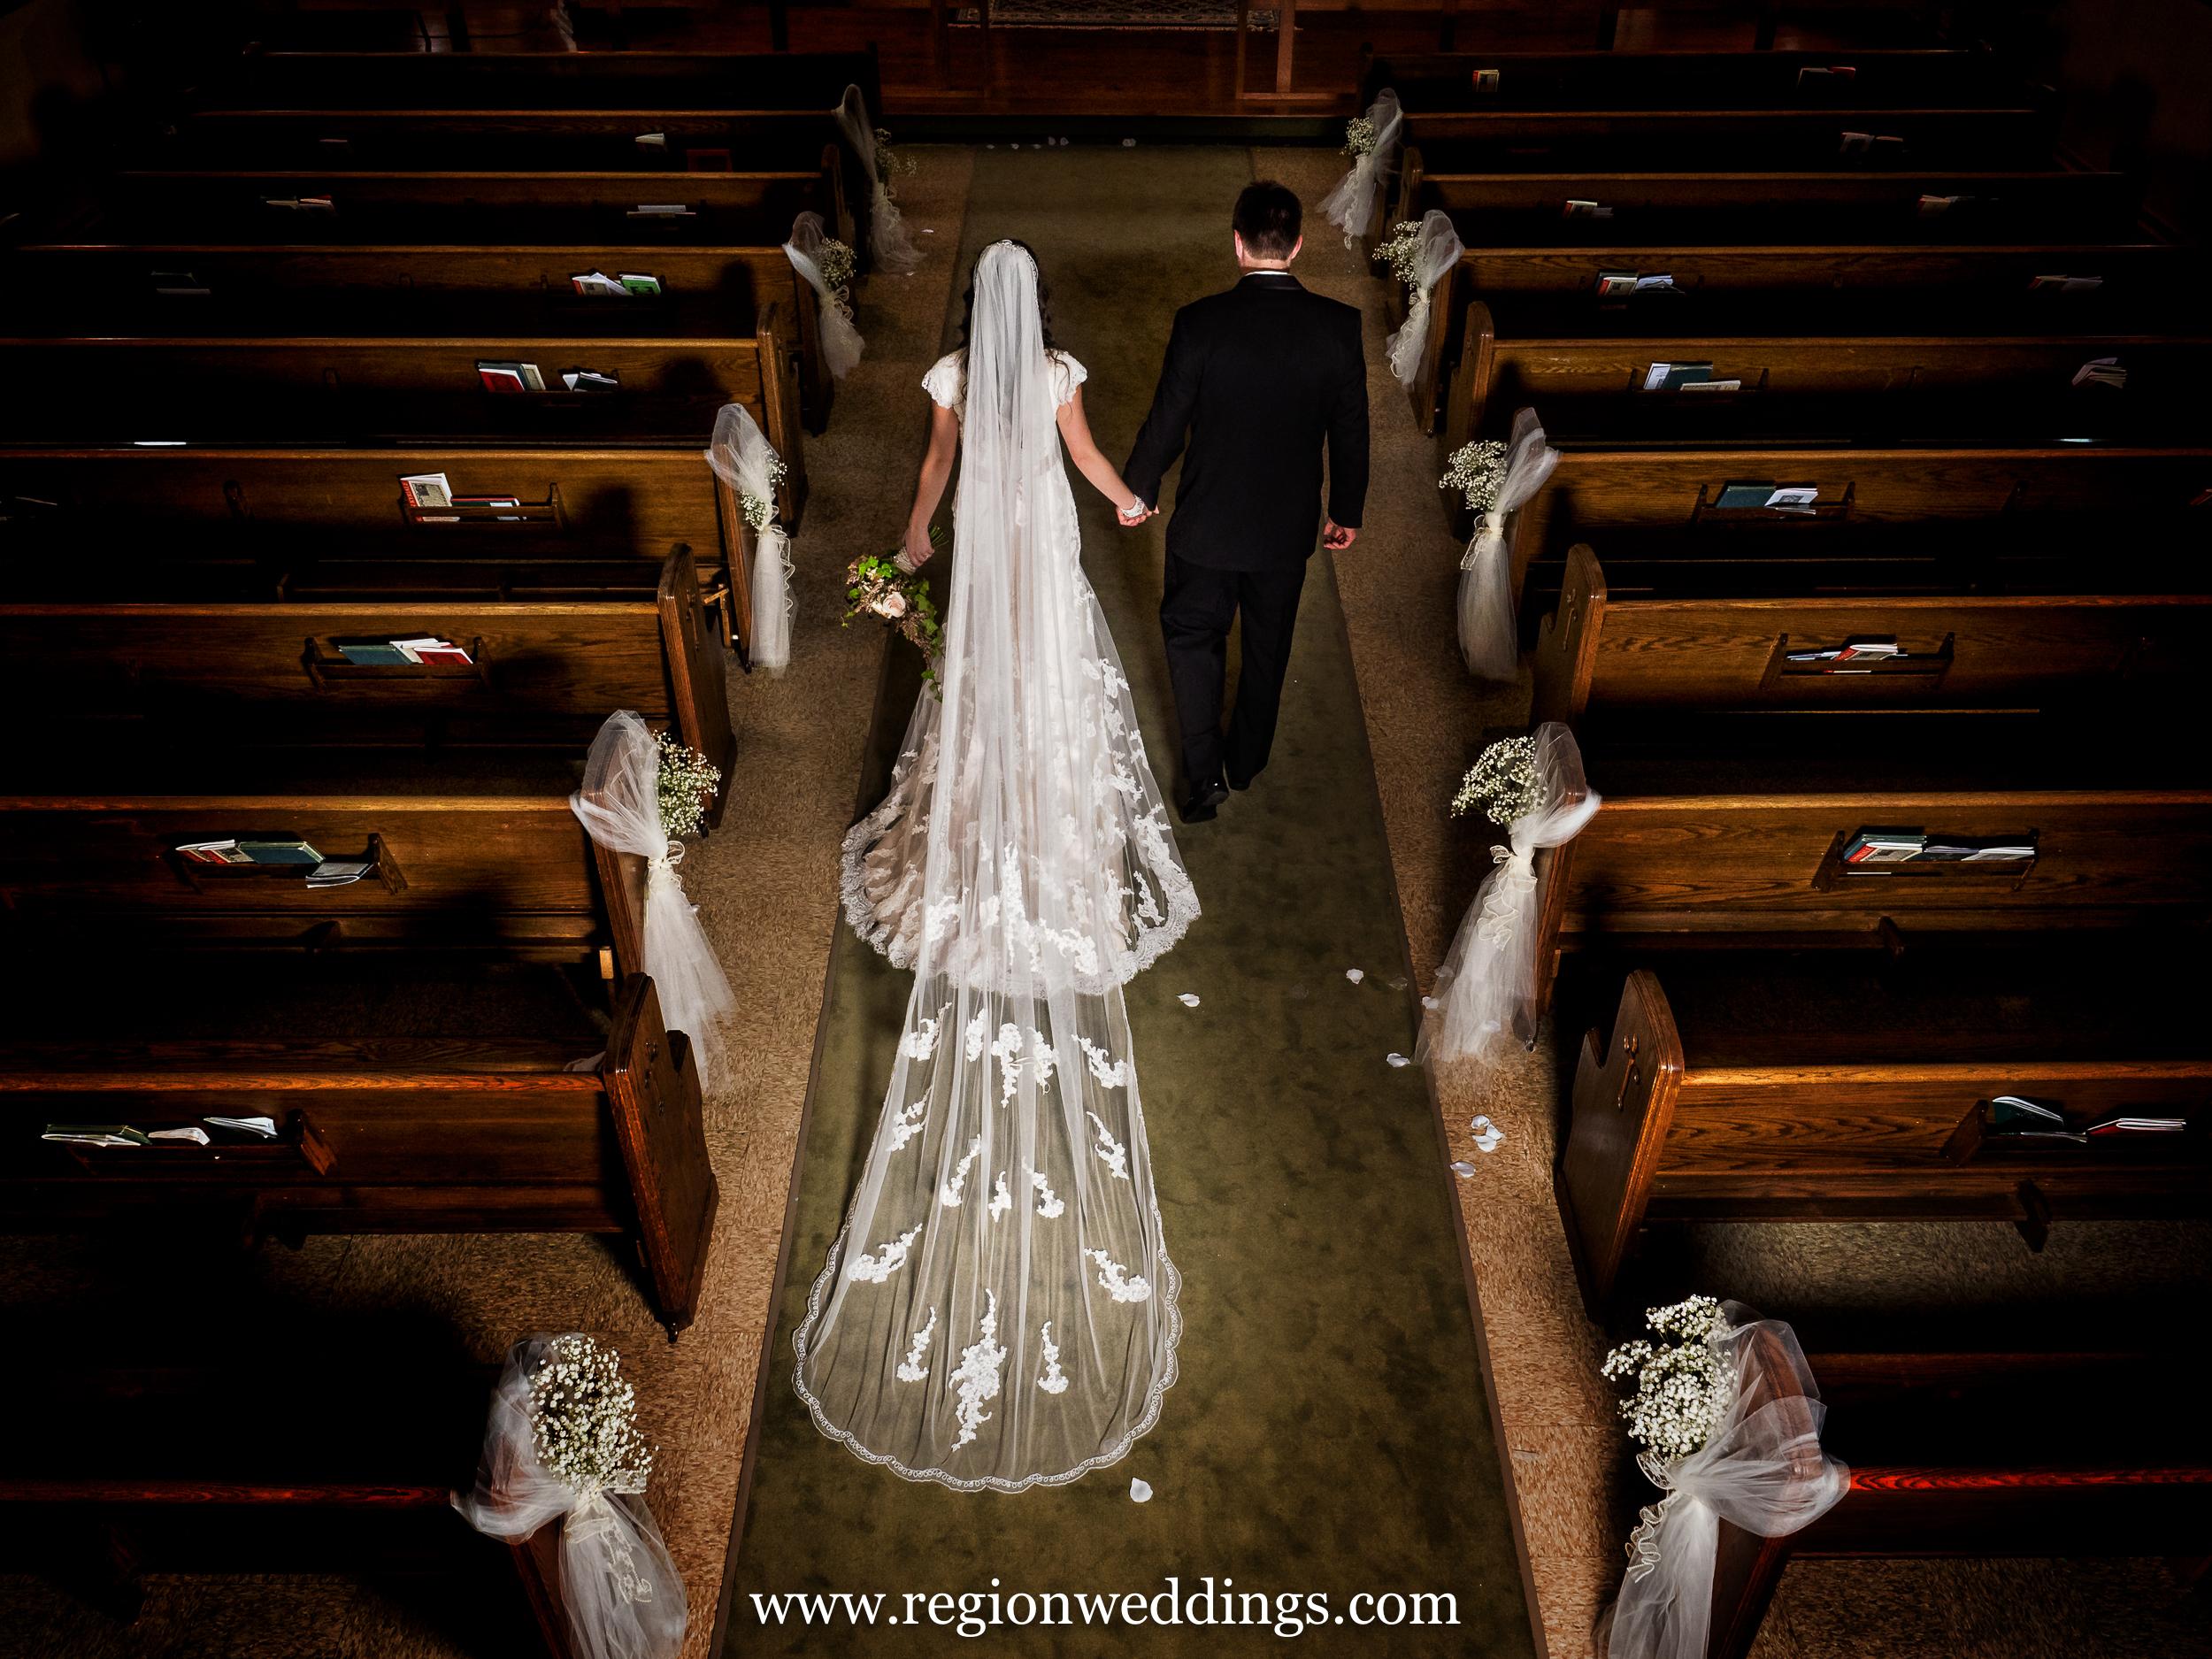 long-veil-church-wedding-walk